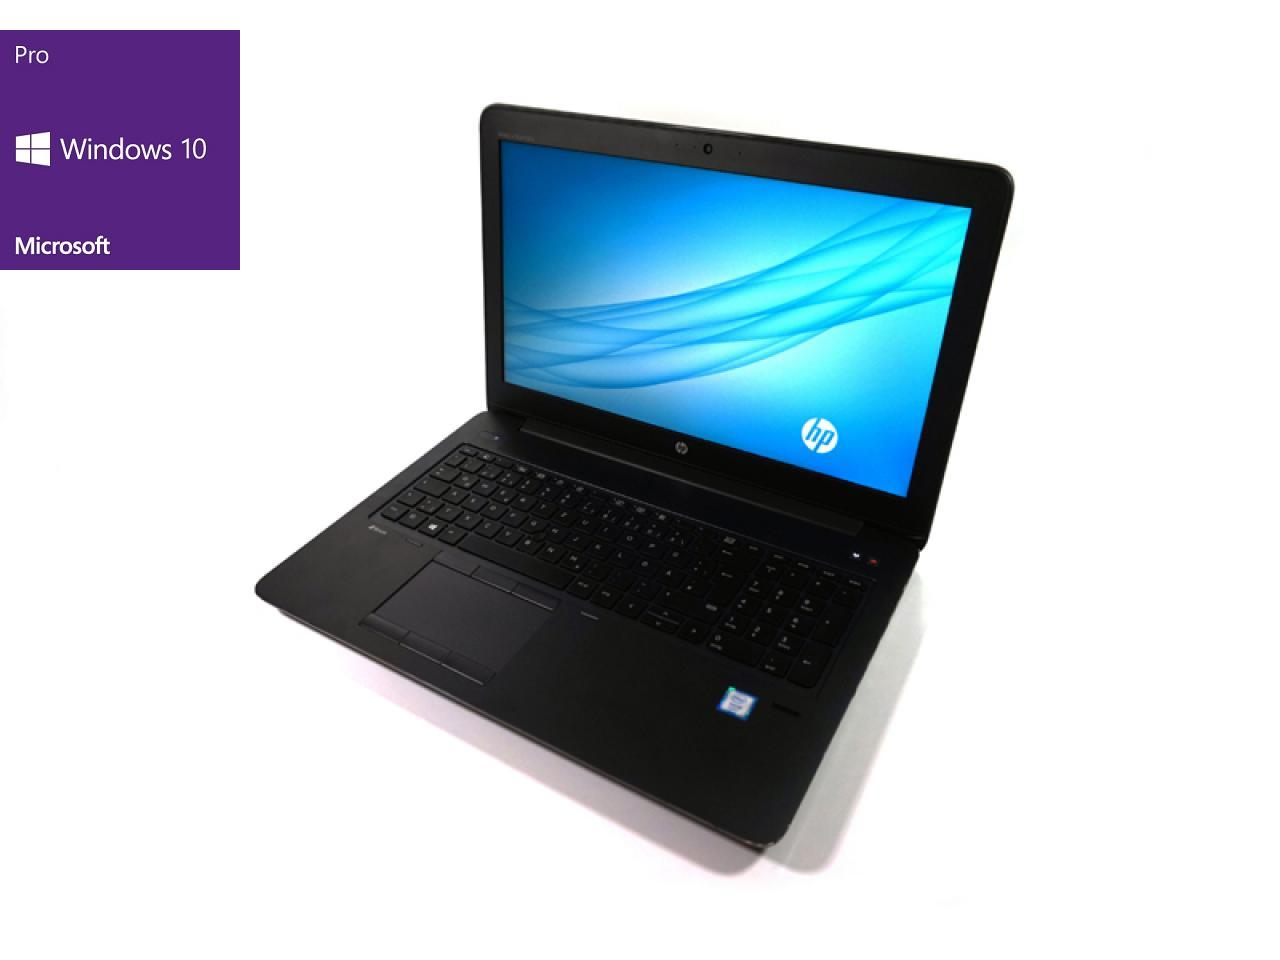 Hewlett Packard ZBook 15 G3